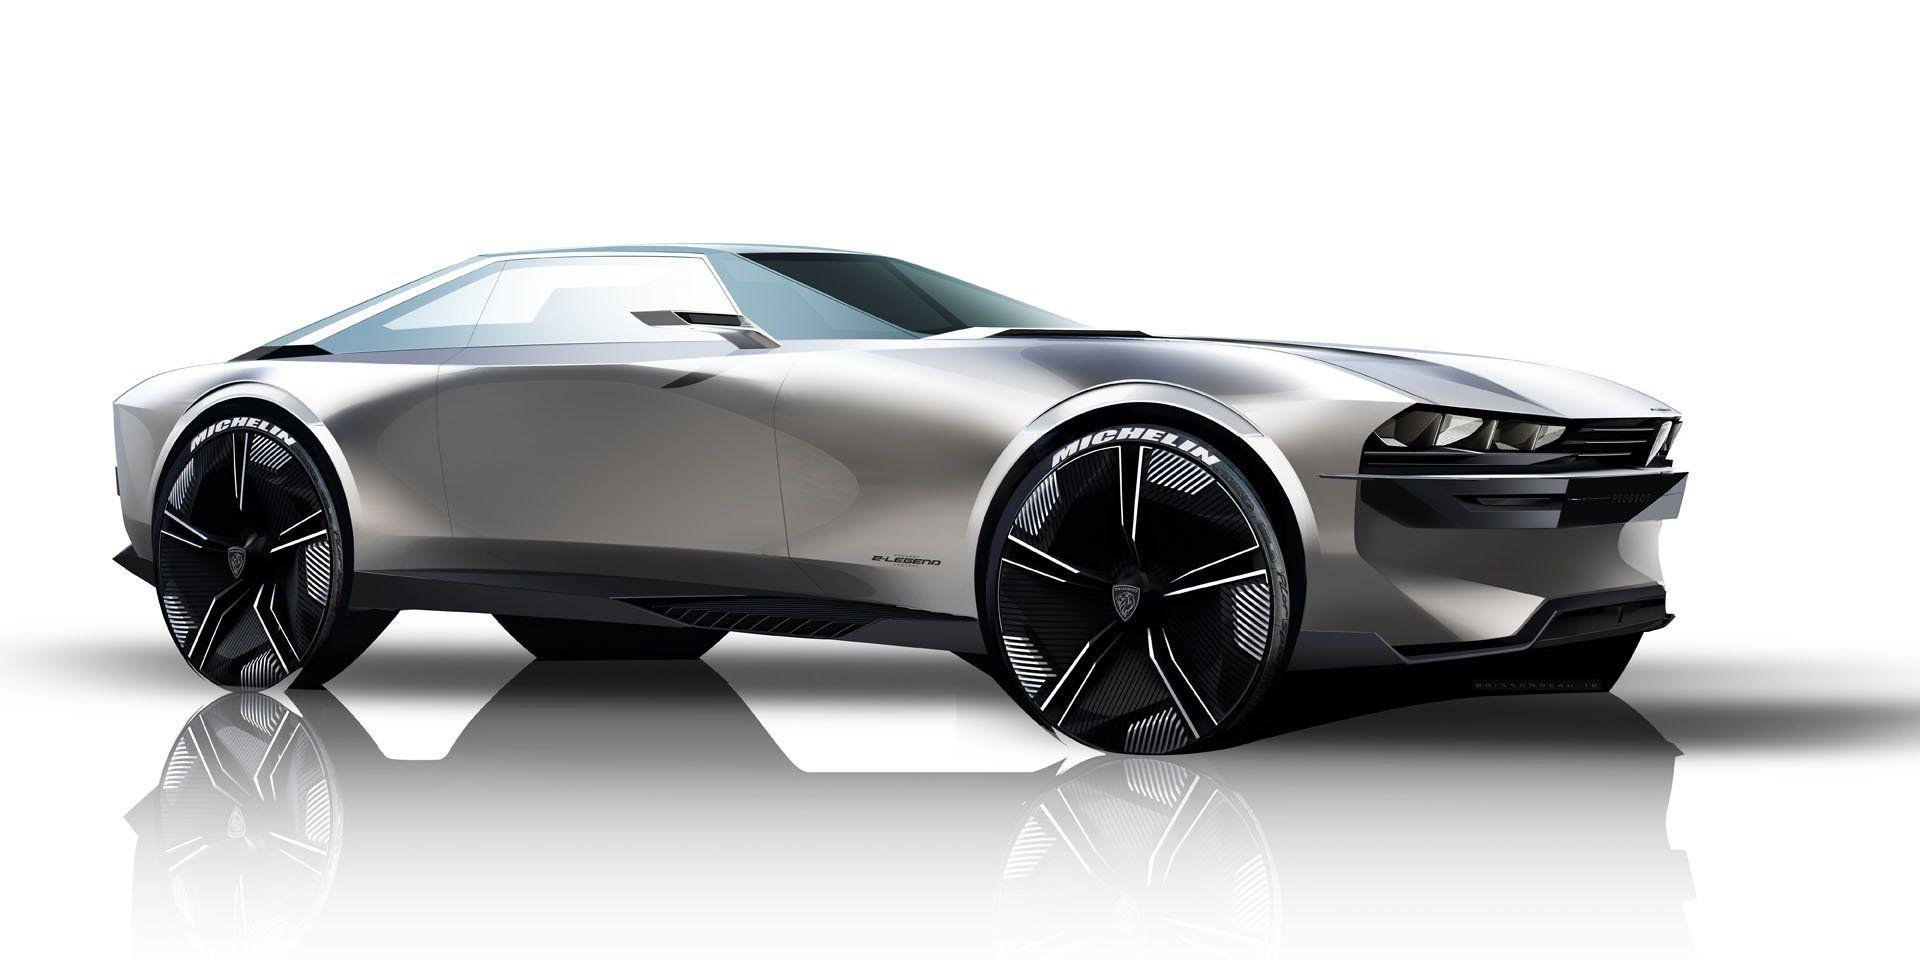 Peugeot E Legend Concept Takes Retro Design Into The Future In Paris Carscoops Concept Car Design Car Design Car